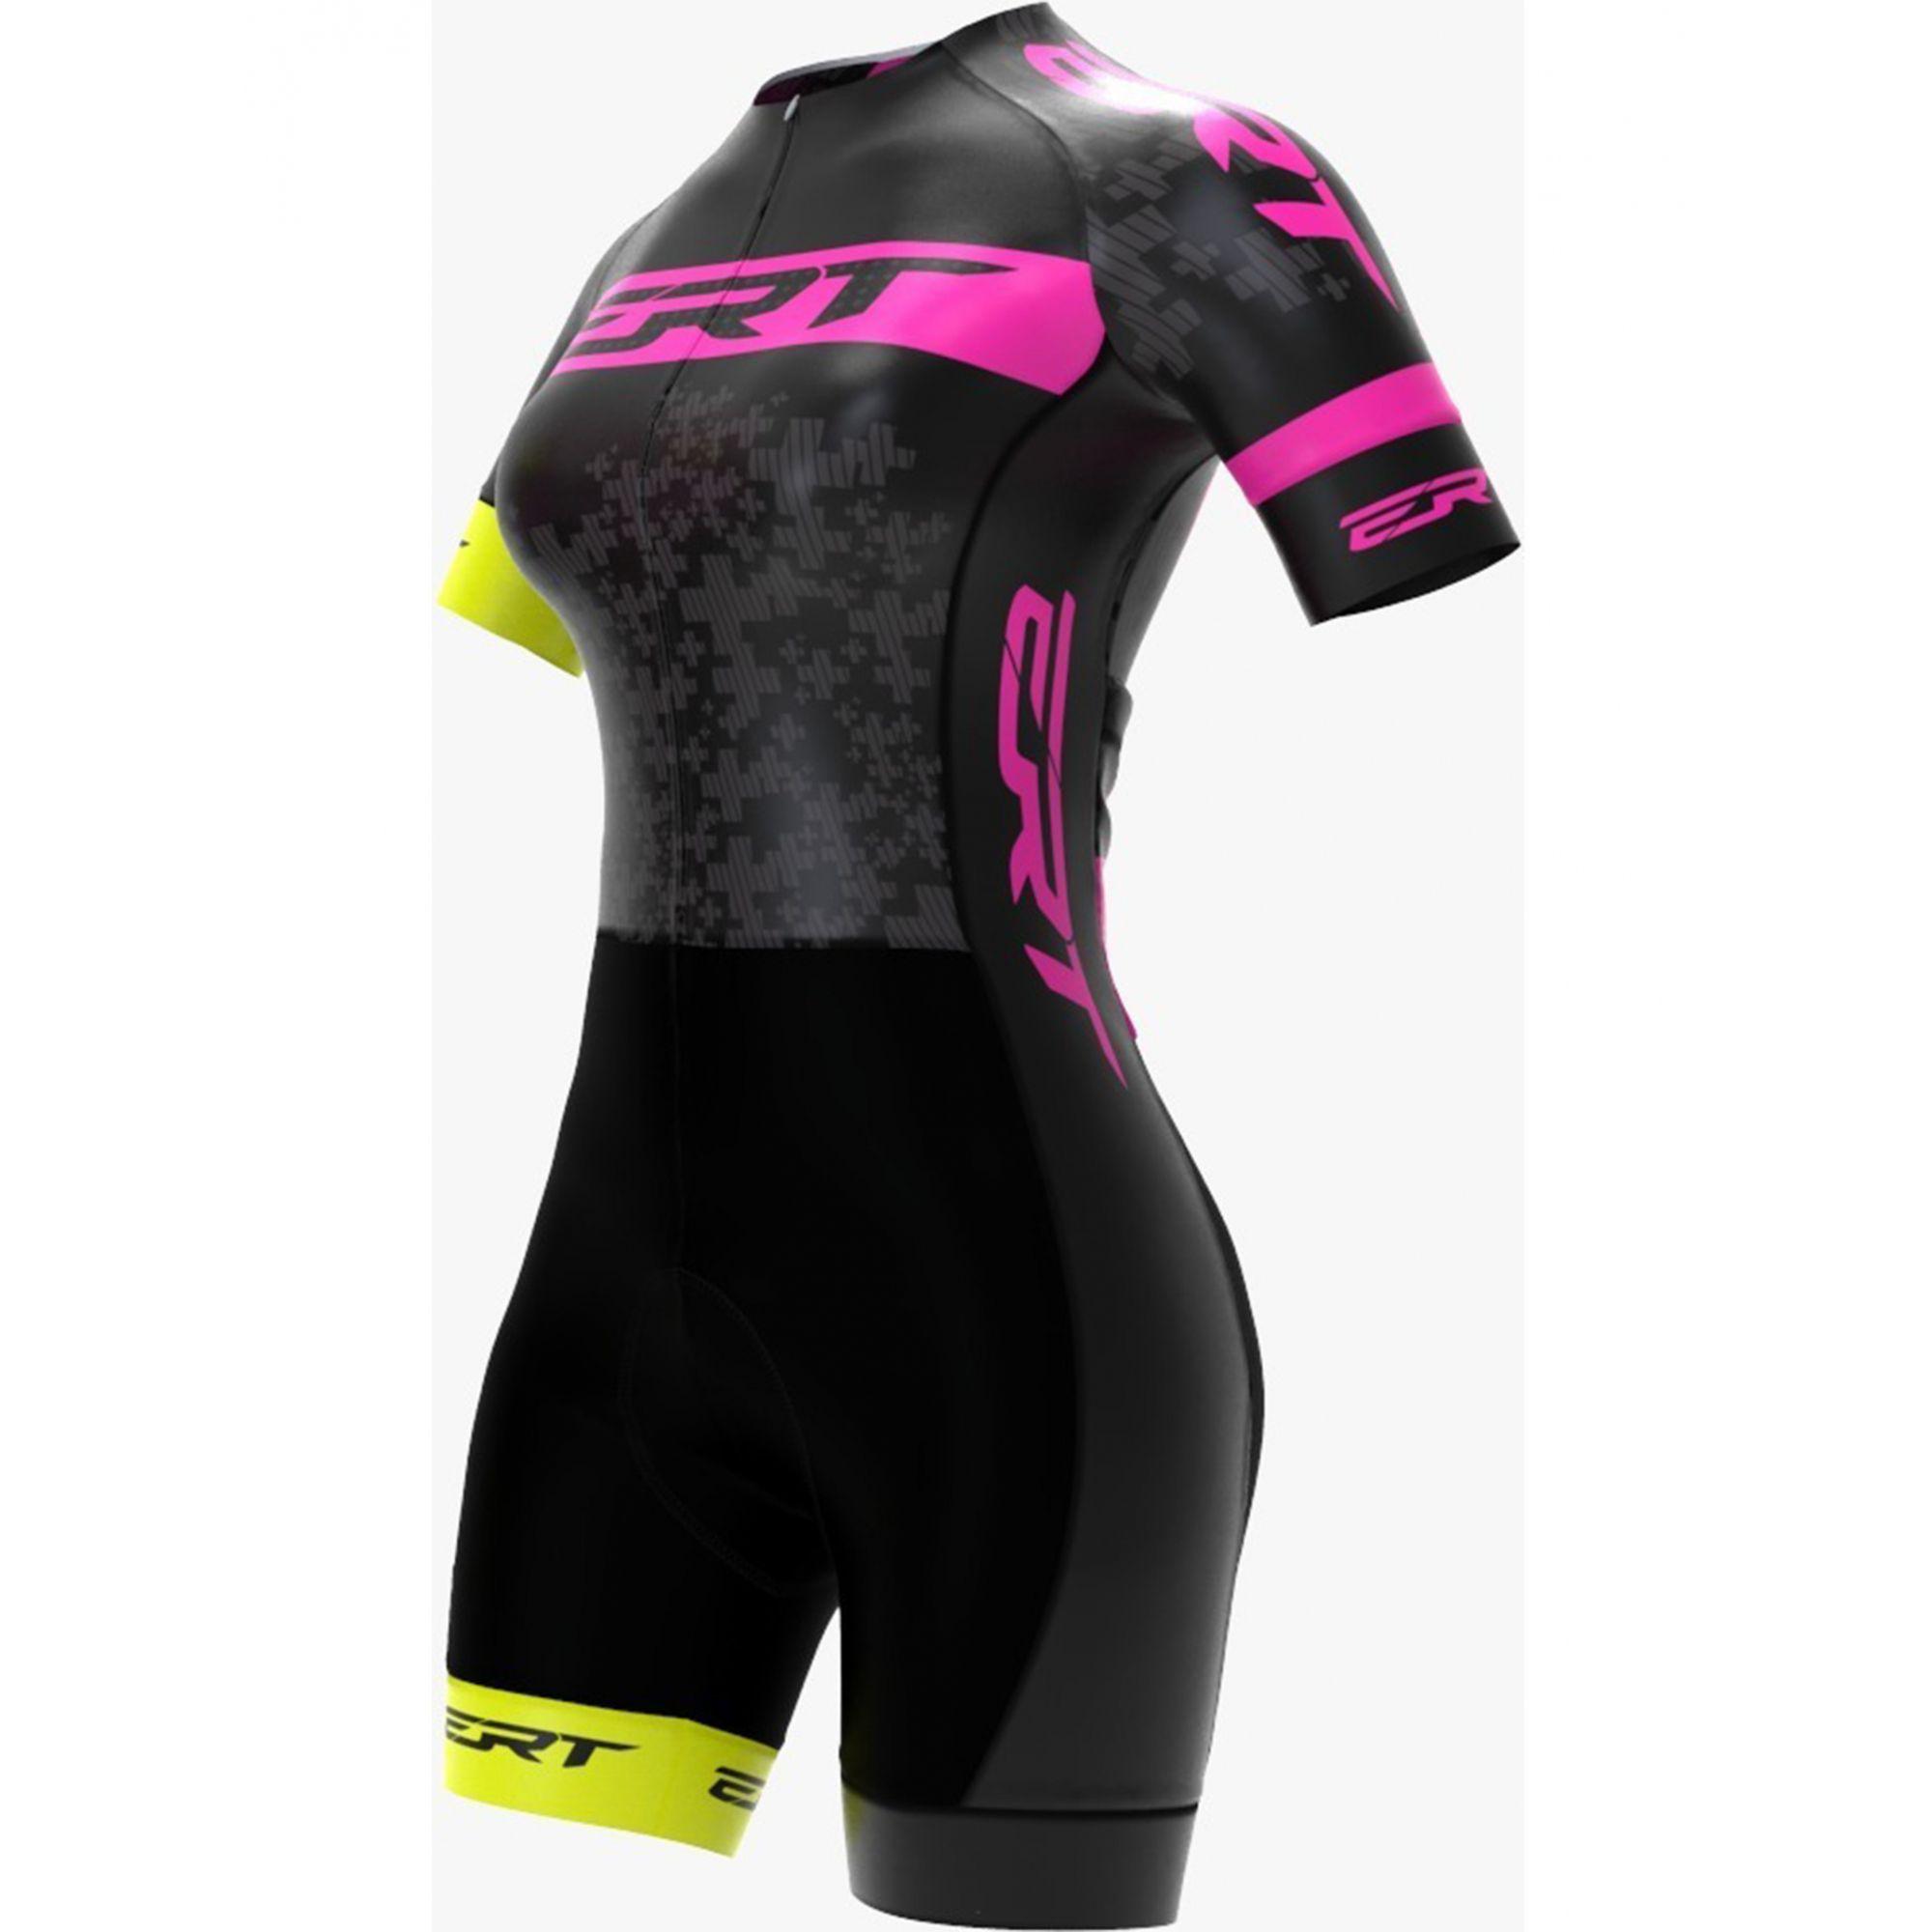 Macaquinho Ciclismo Preto/Rosa Forro Dual Pro- ERT